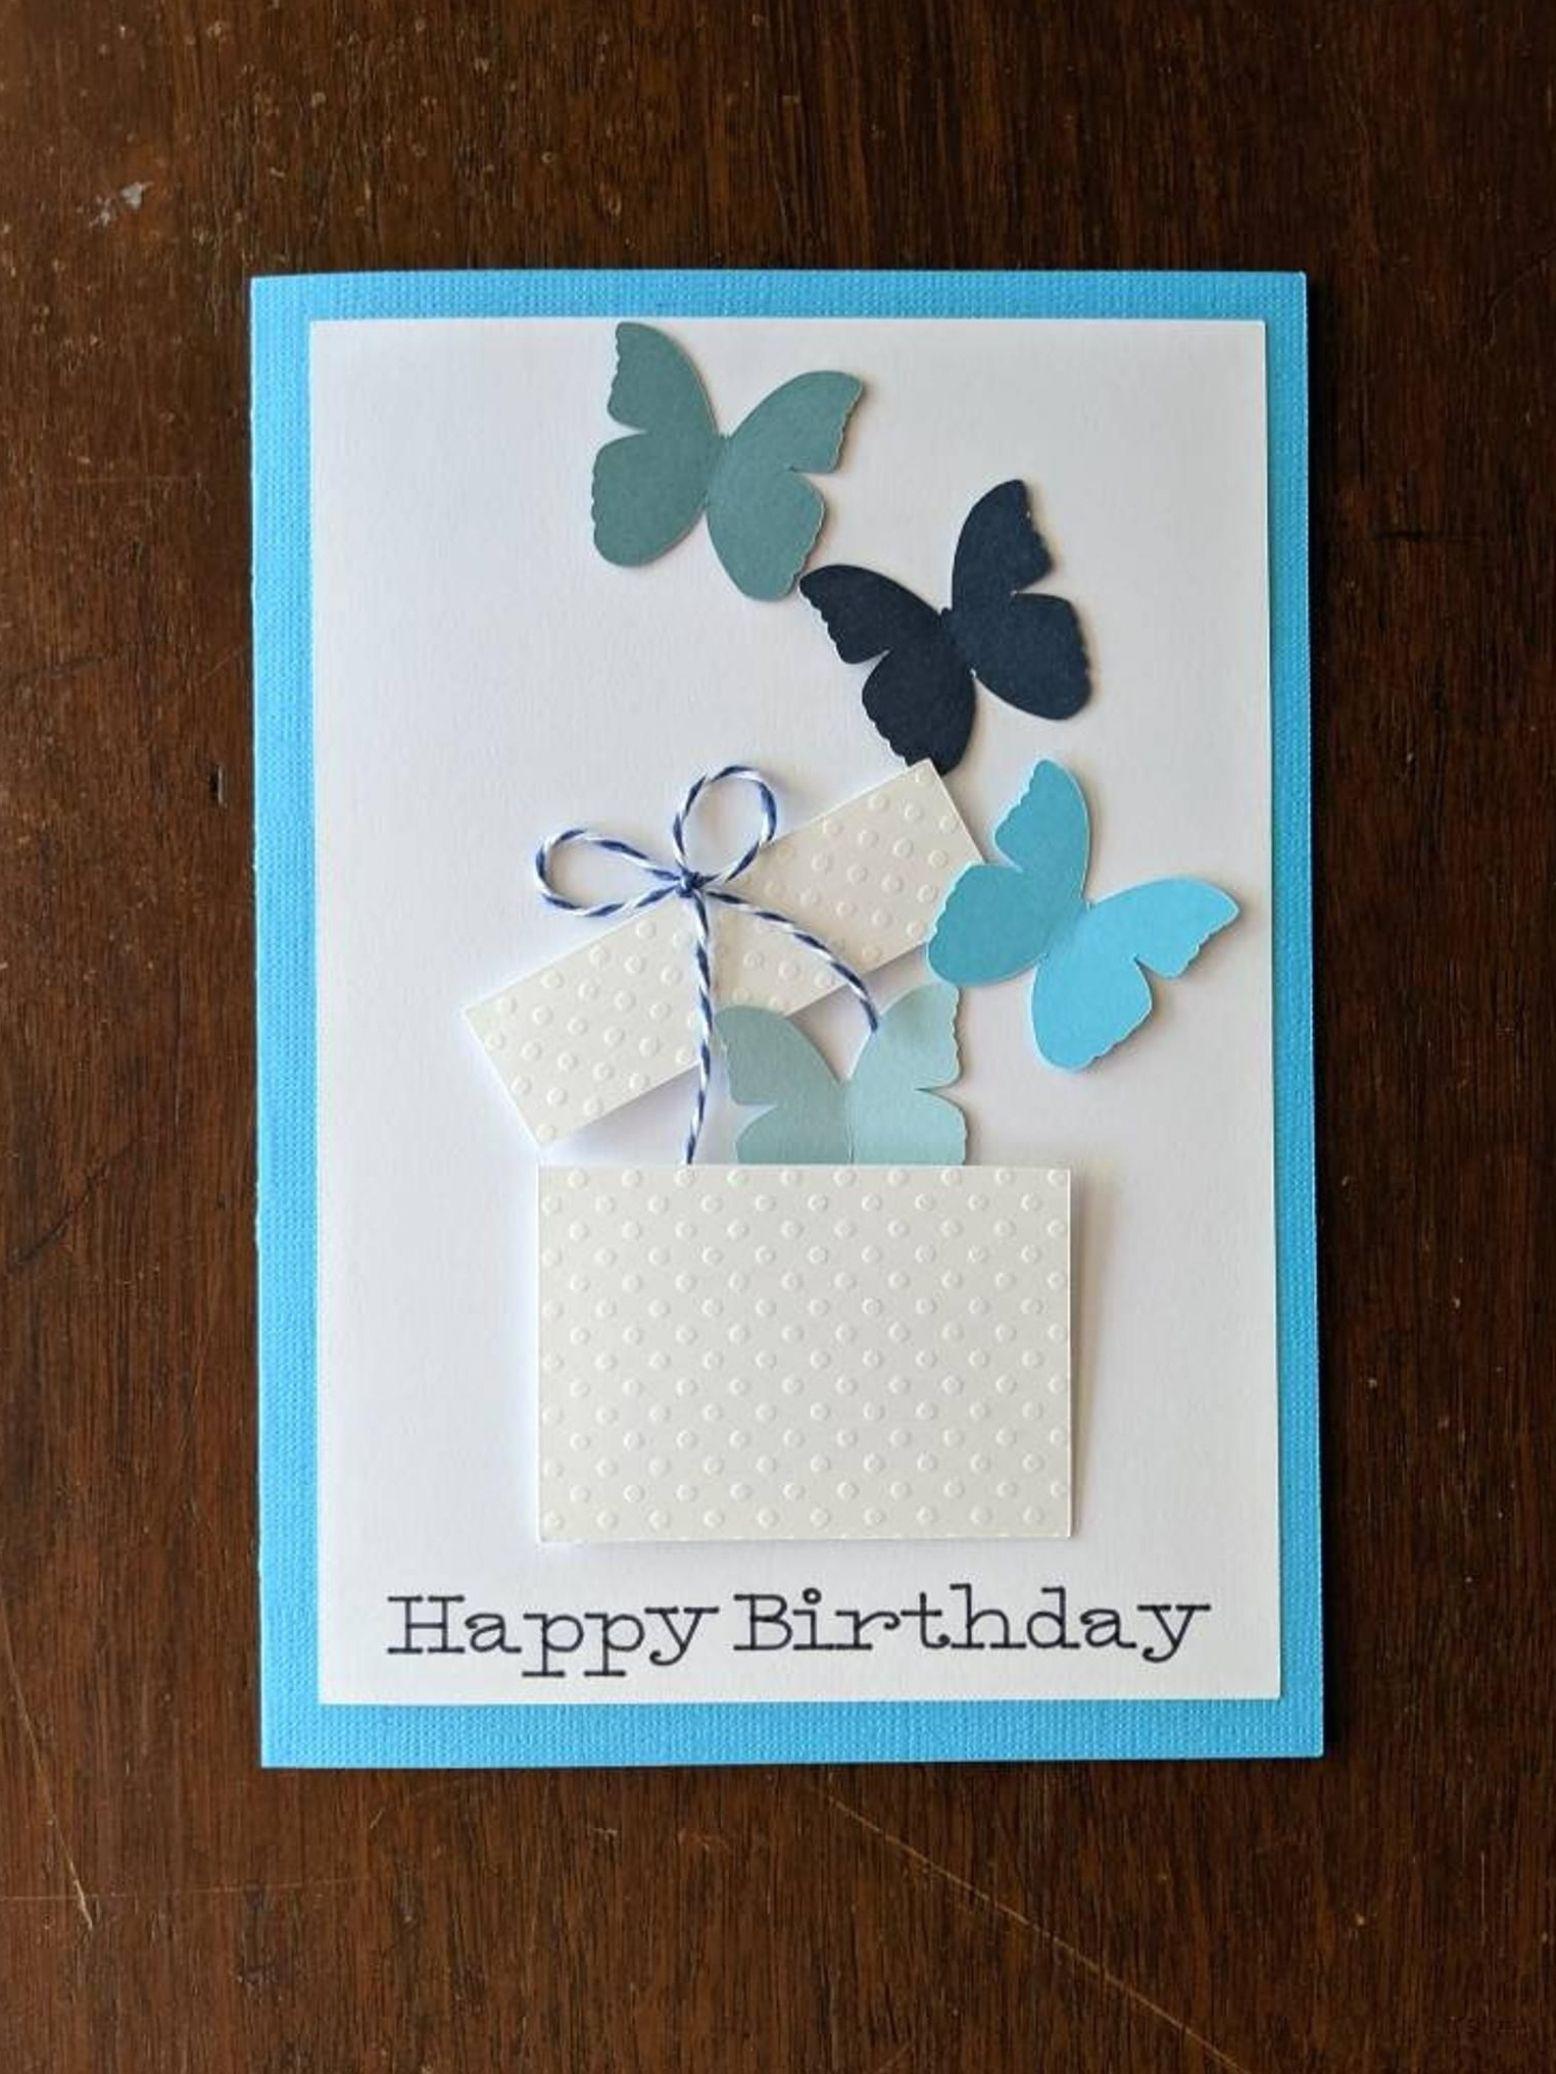 Printable Happy Birthday Card Download Birthday Card Download Floral Birthday Greeting Card In 2021 Handmade Birthday Cards Birthday Card Craft Butterfly Birthday Cards